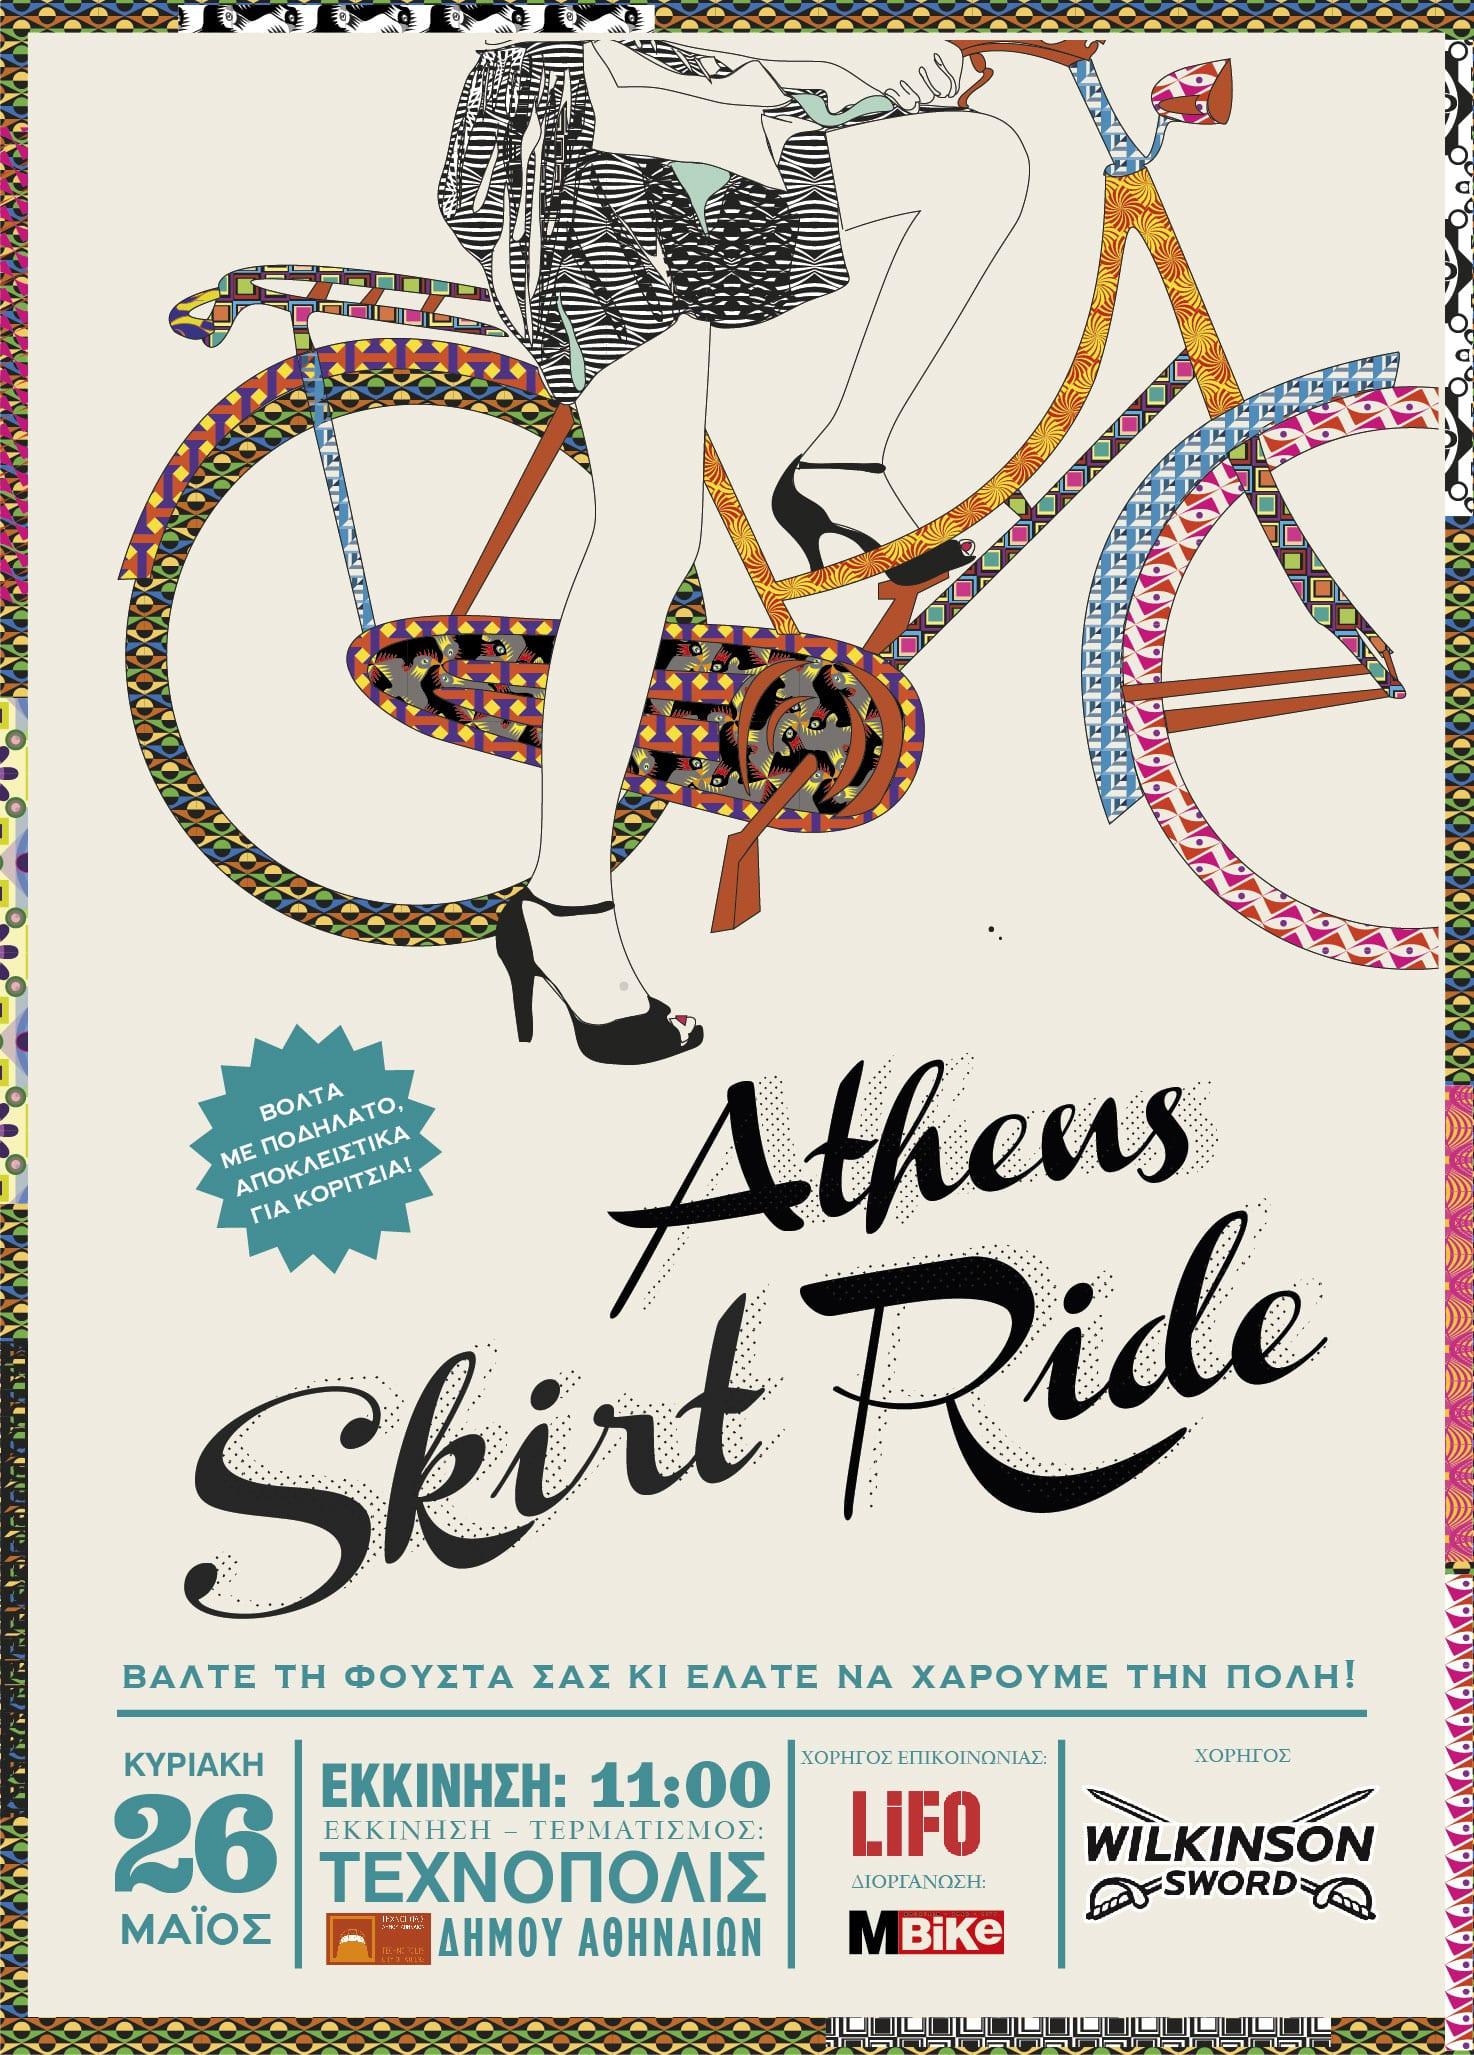 athens_skirt_ride